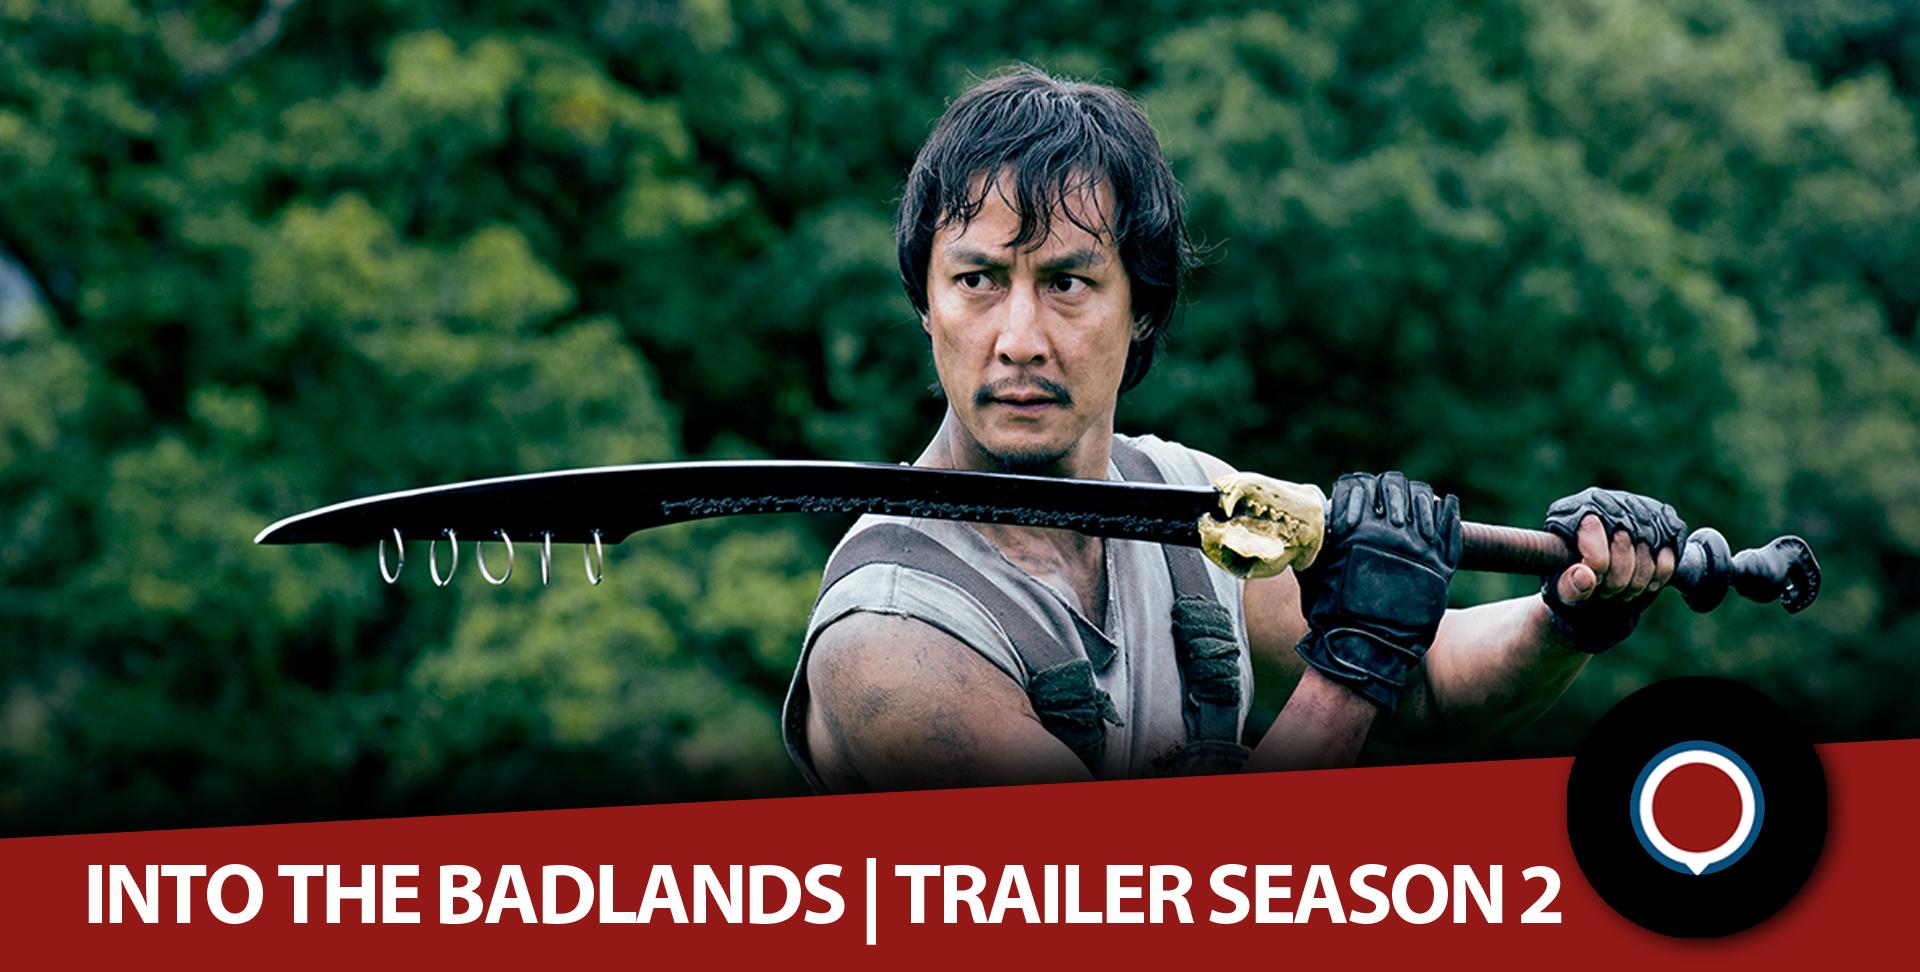 into the badlands trailer